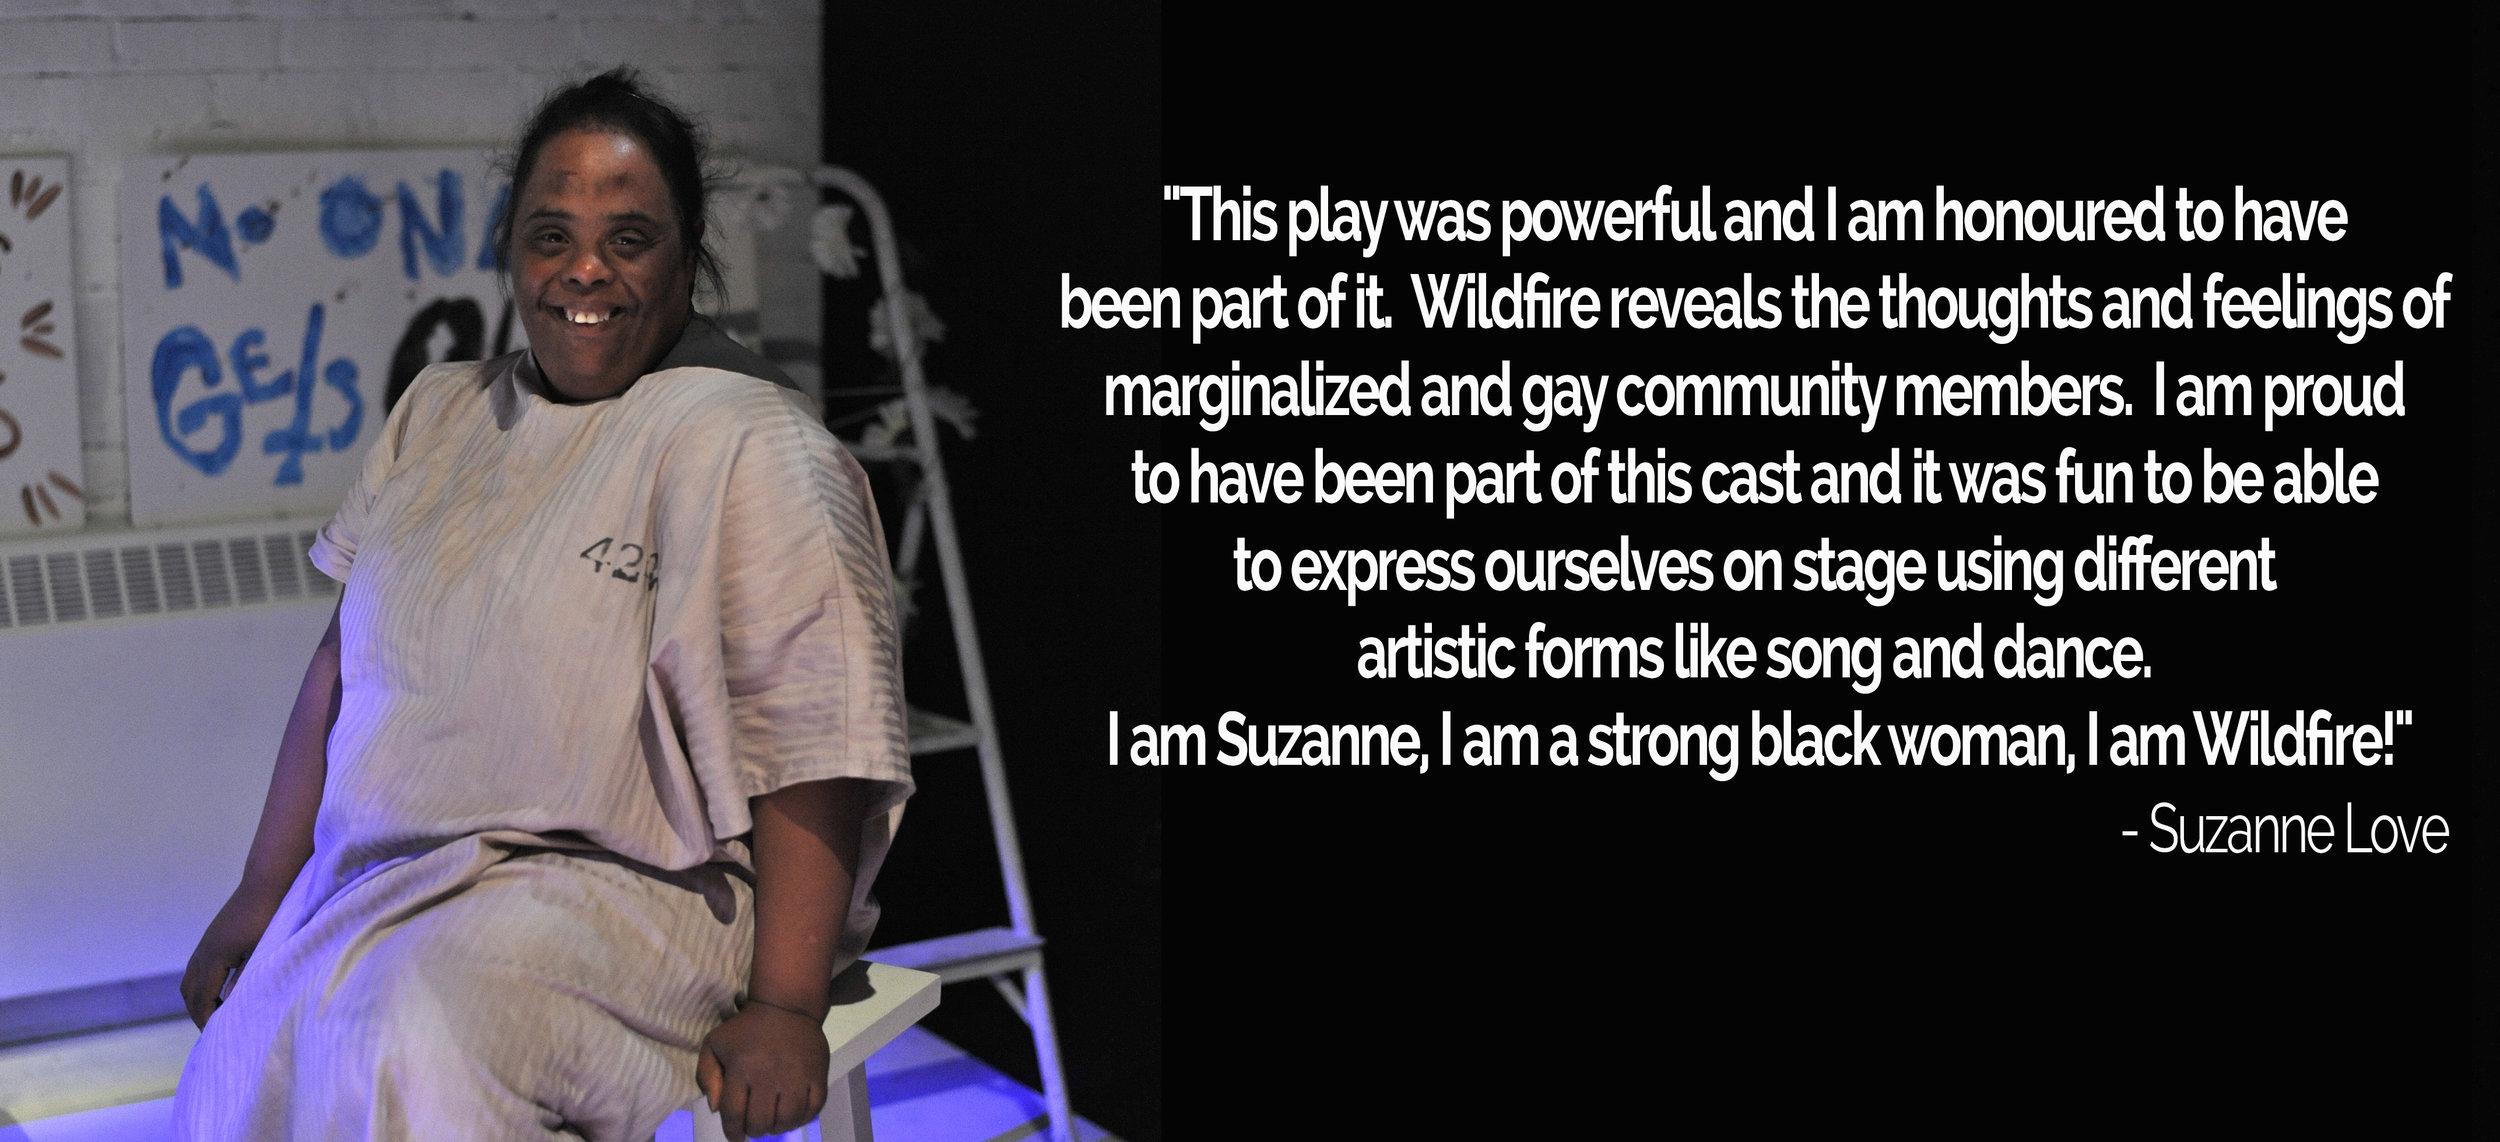 Suzannel quote.jpg